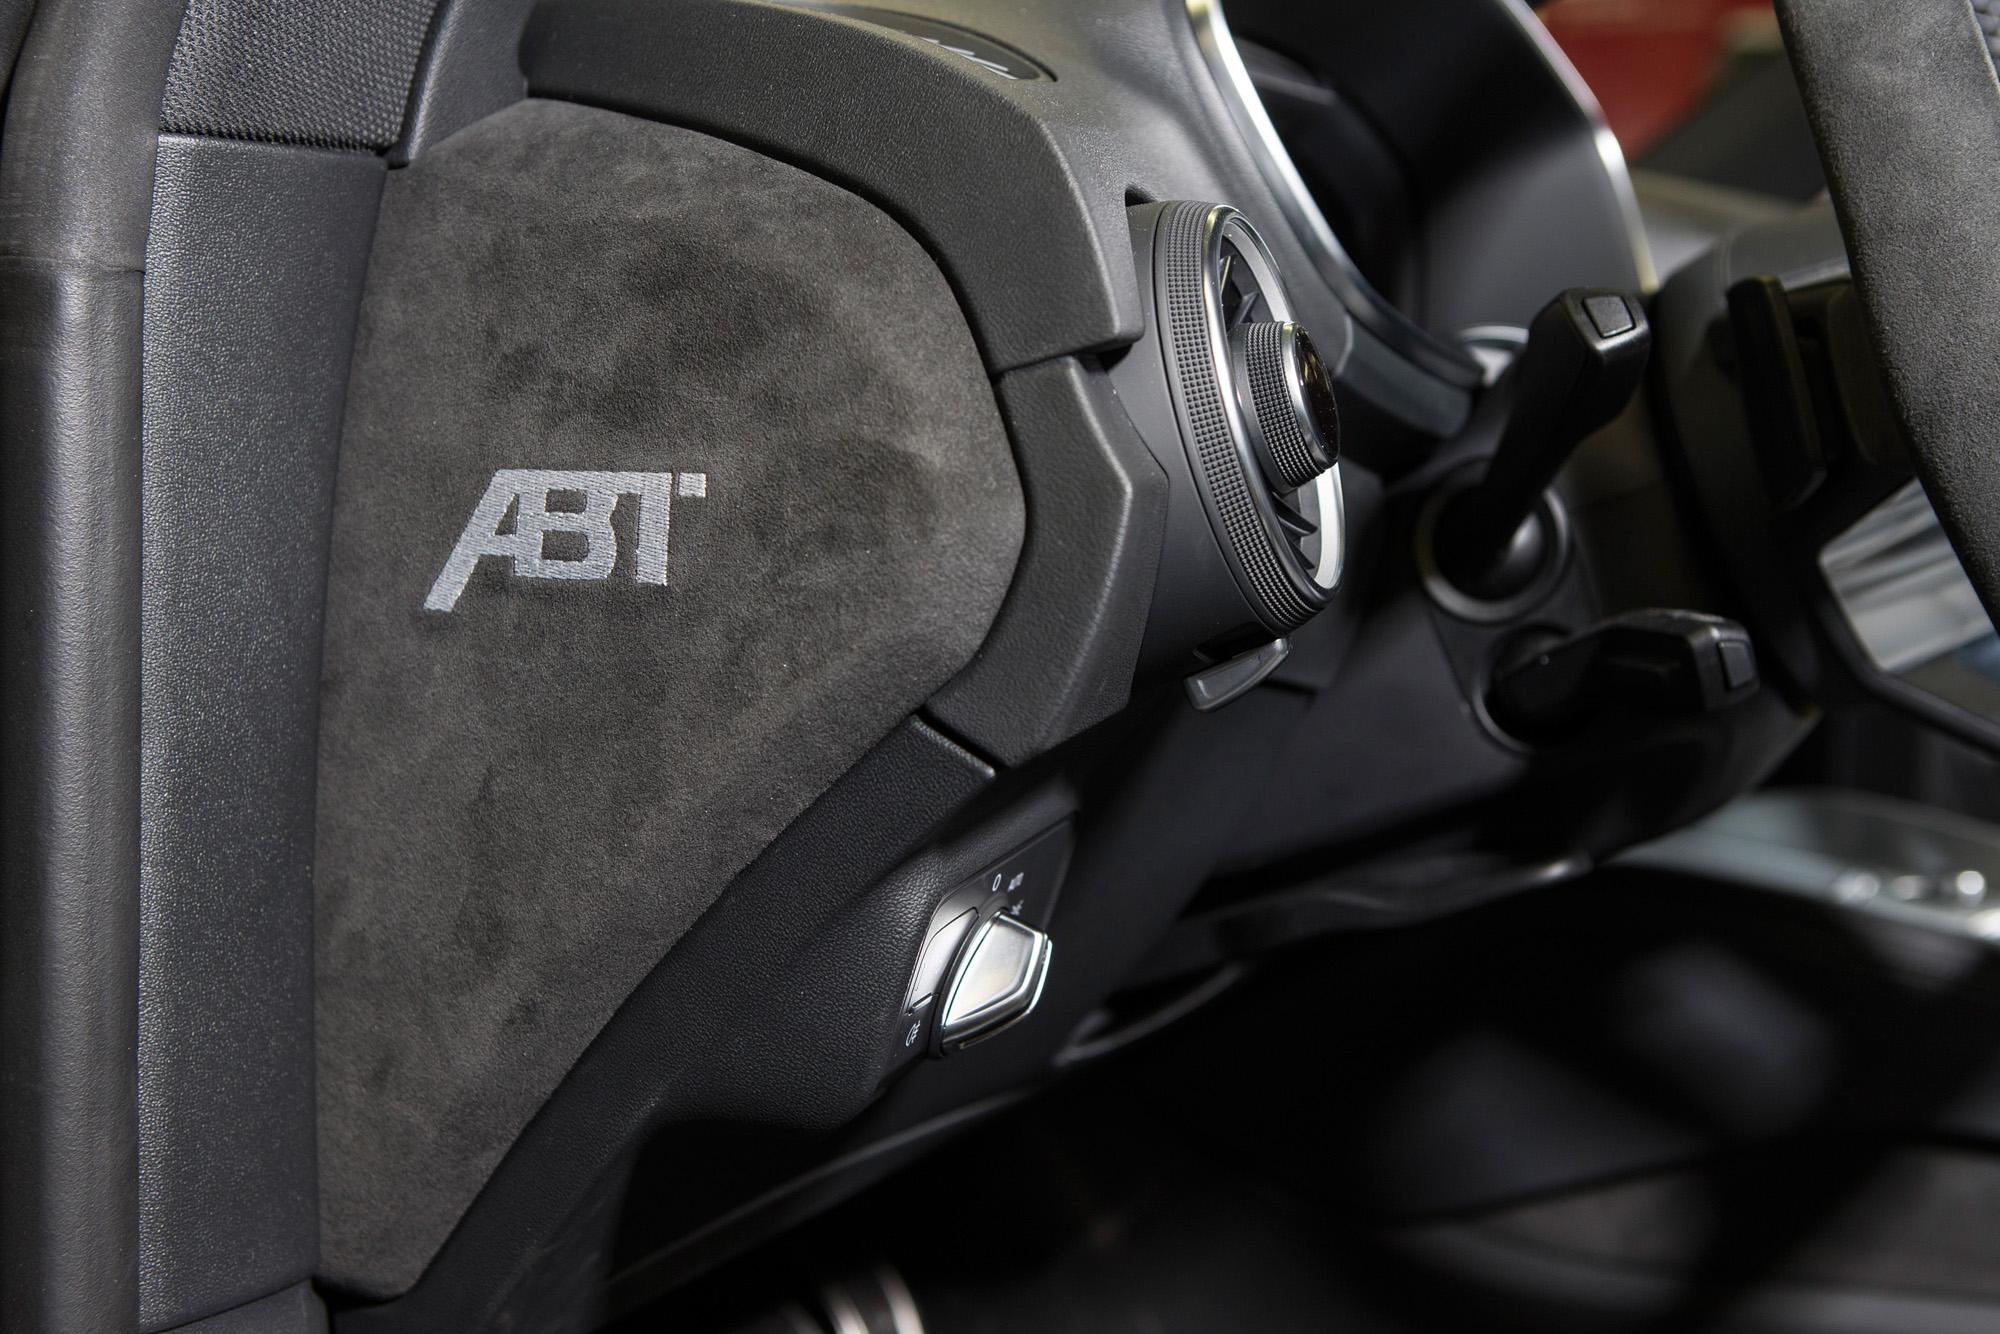 audi-tt-8s-gunmetal-abt-sportsline-19